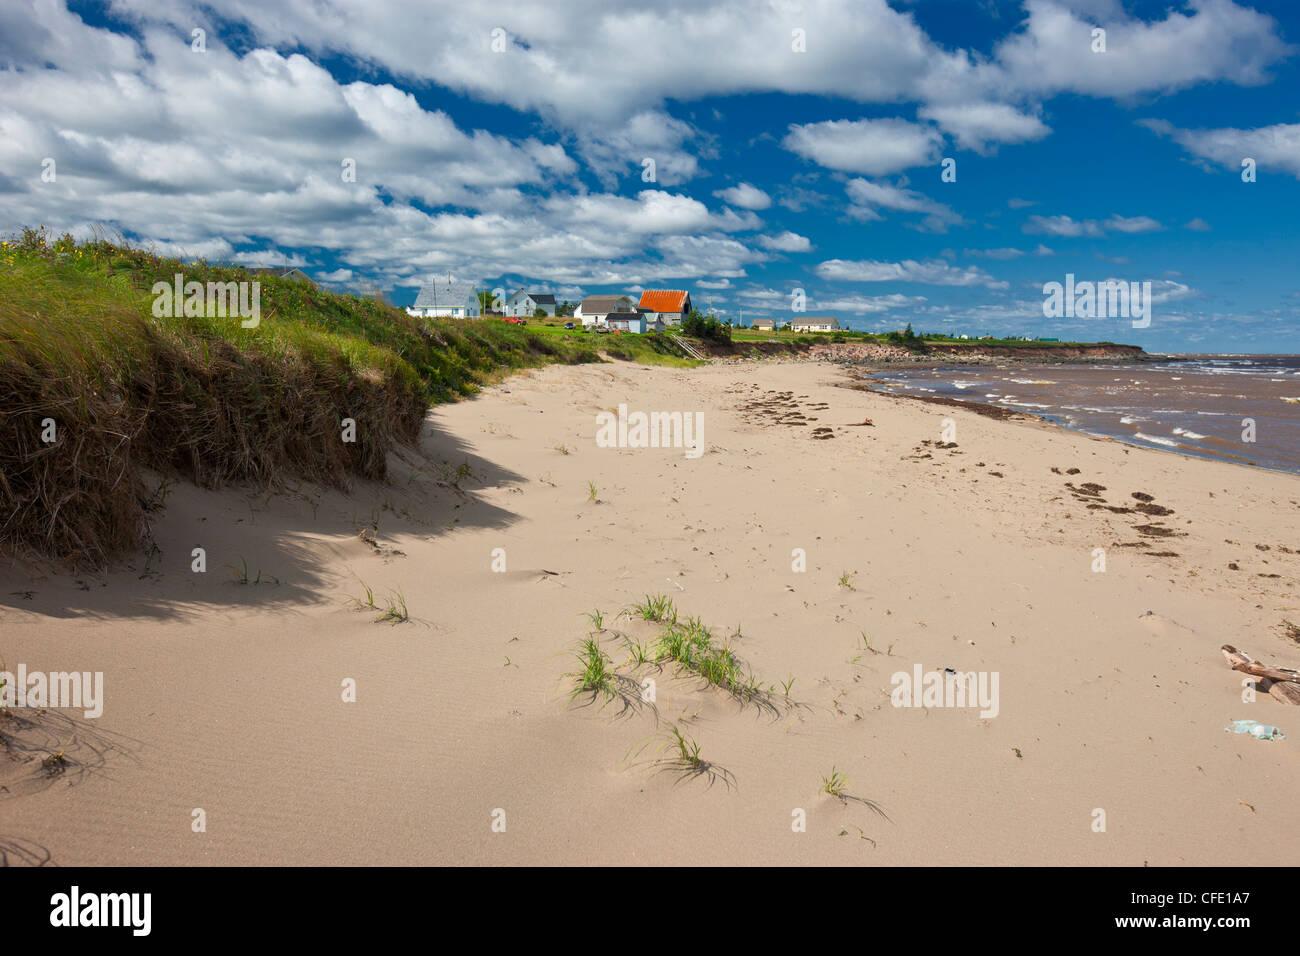 Beach, Wharf Road, Little Shemogue, Acadian Coast, New Brunswick, Canada - Stock Image